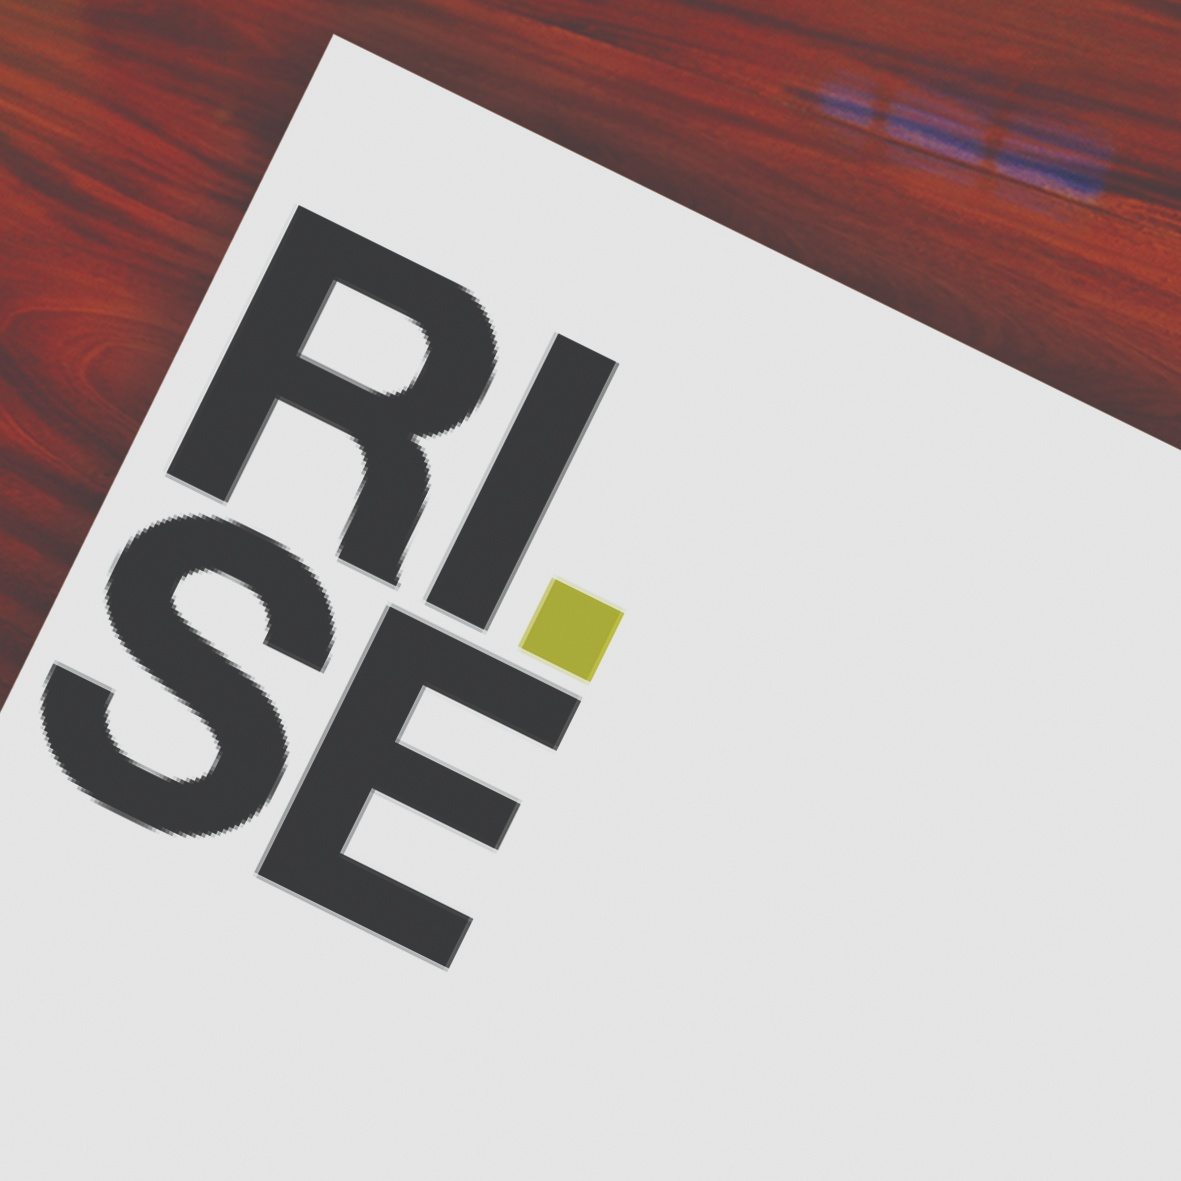 RISE-dokument tiff